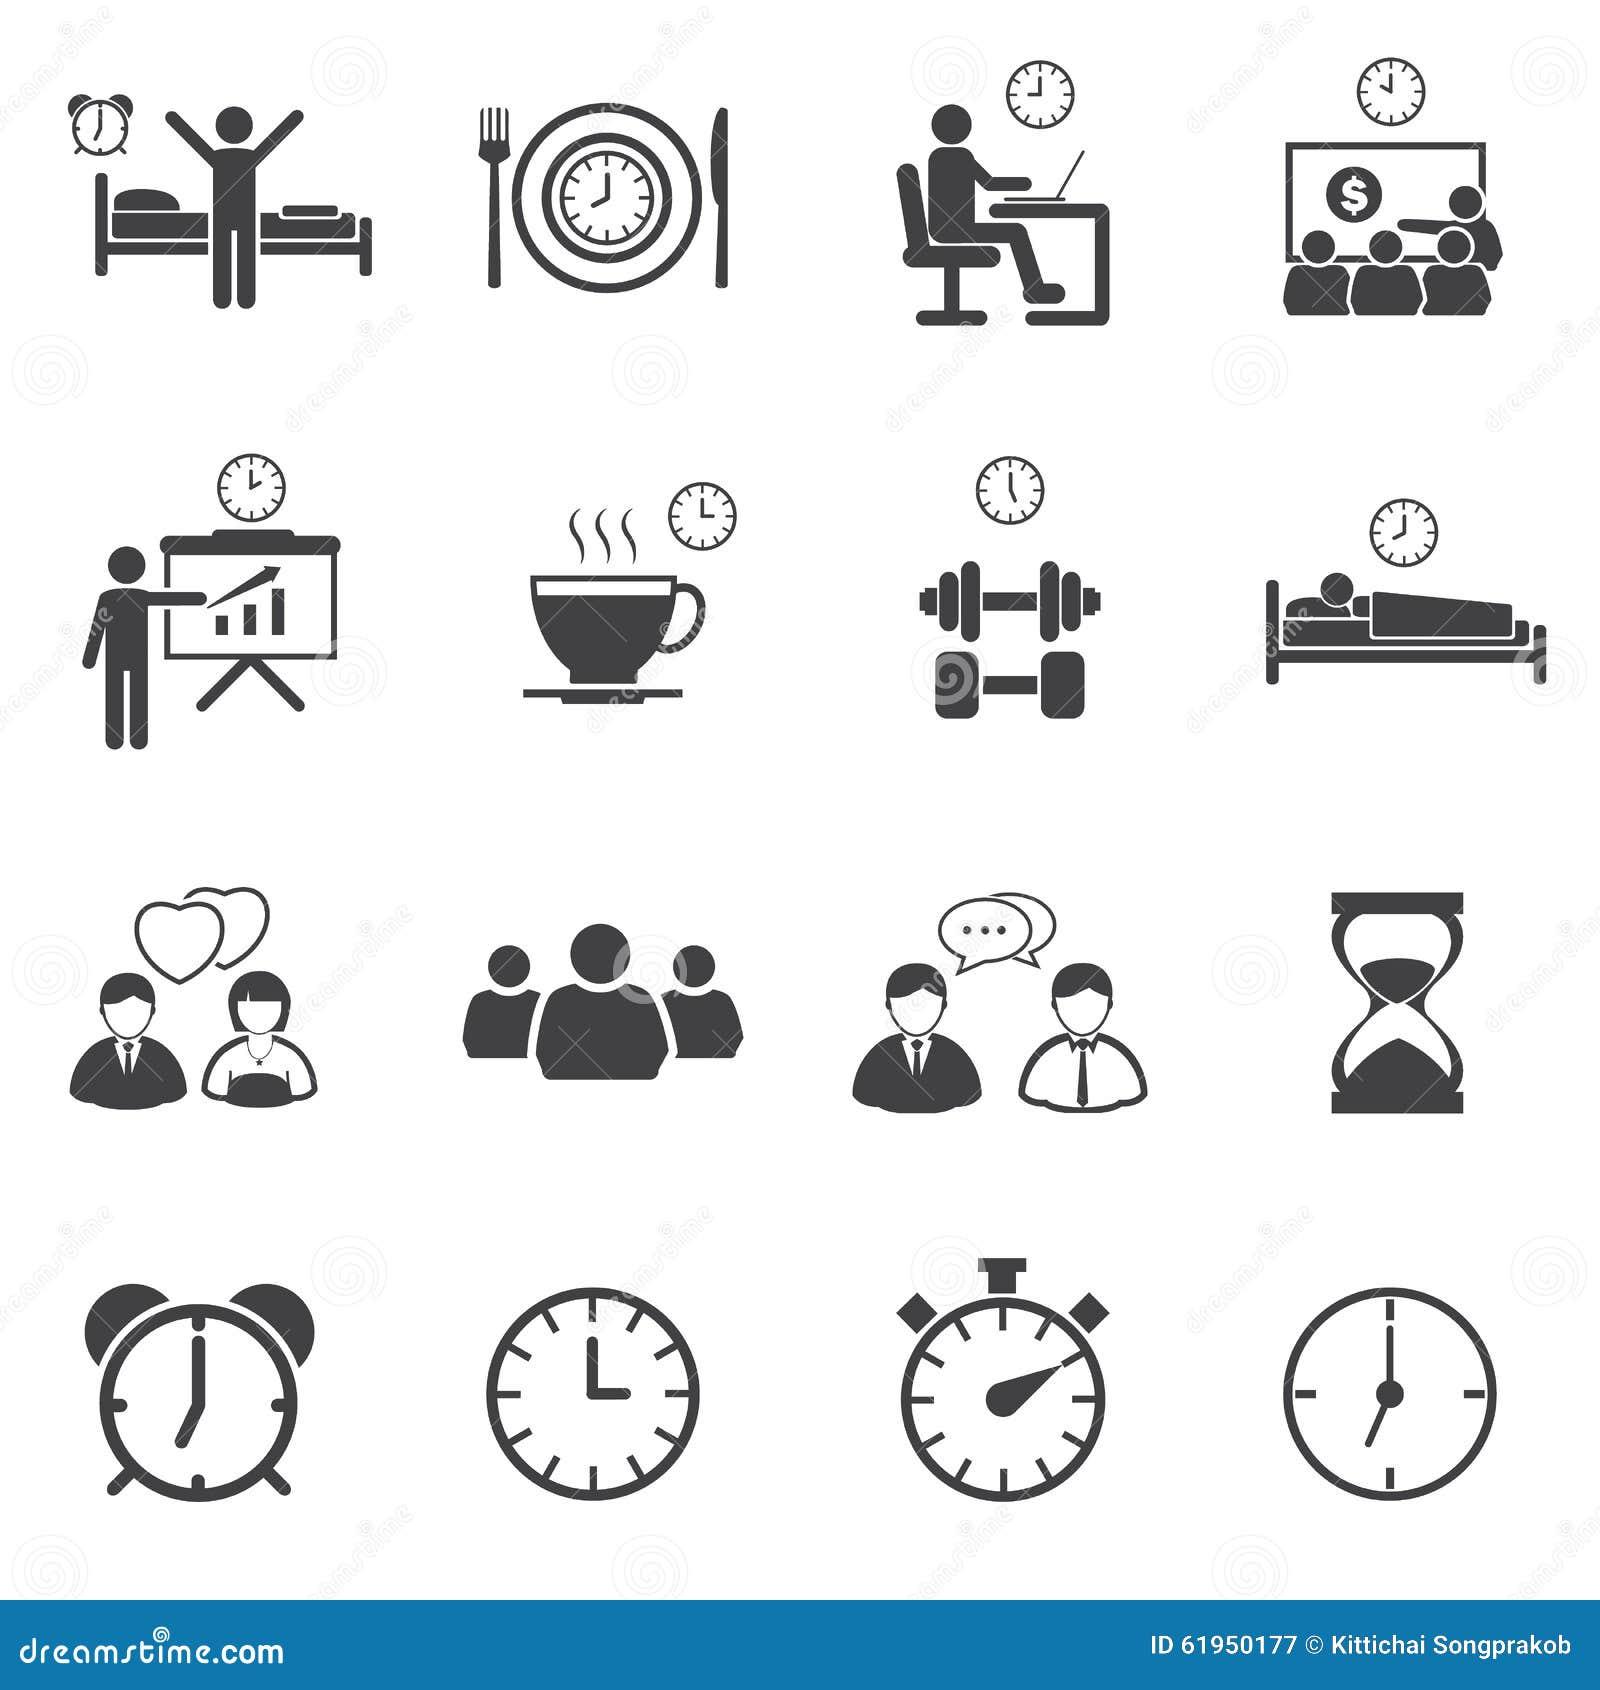 Activity Daily Routine Icons Set Stock Photo Image 61950177